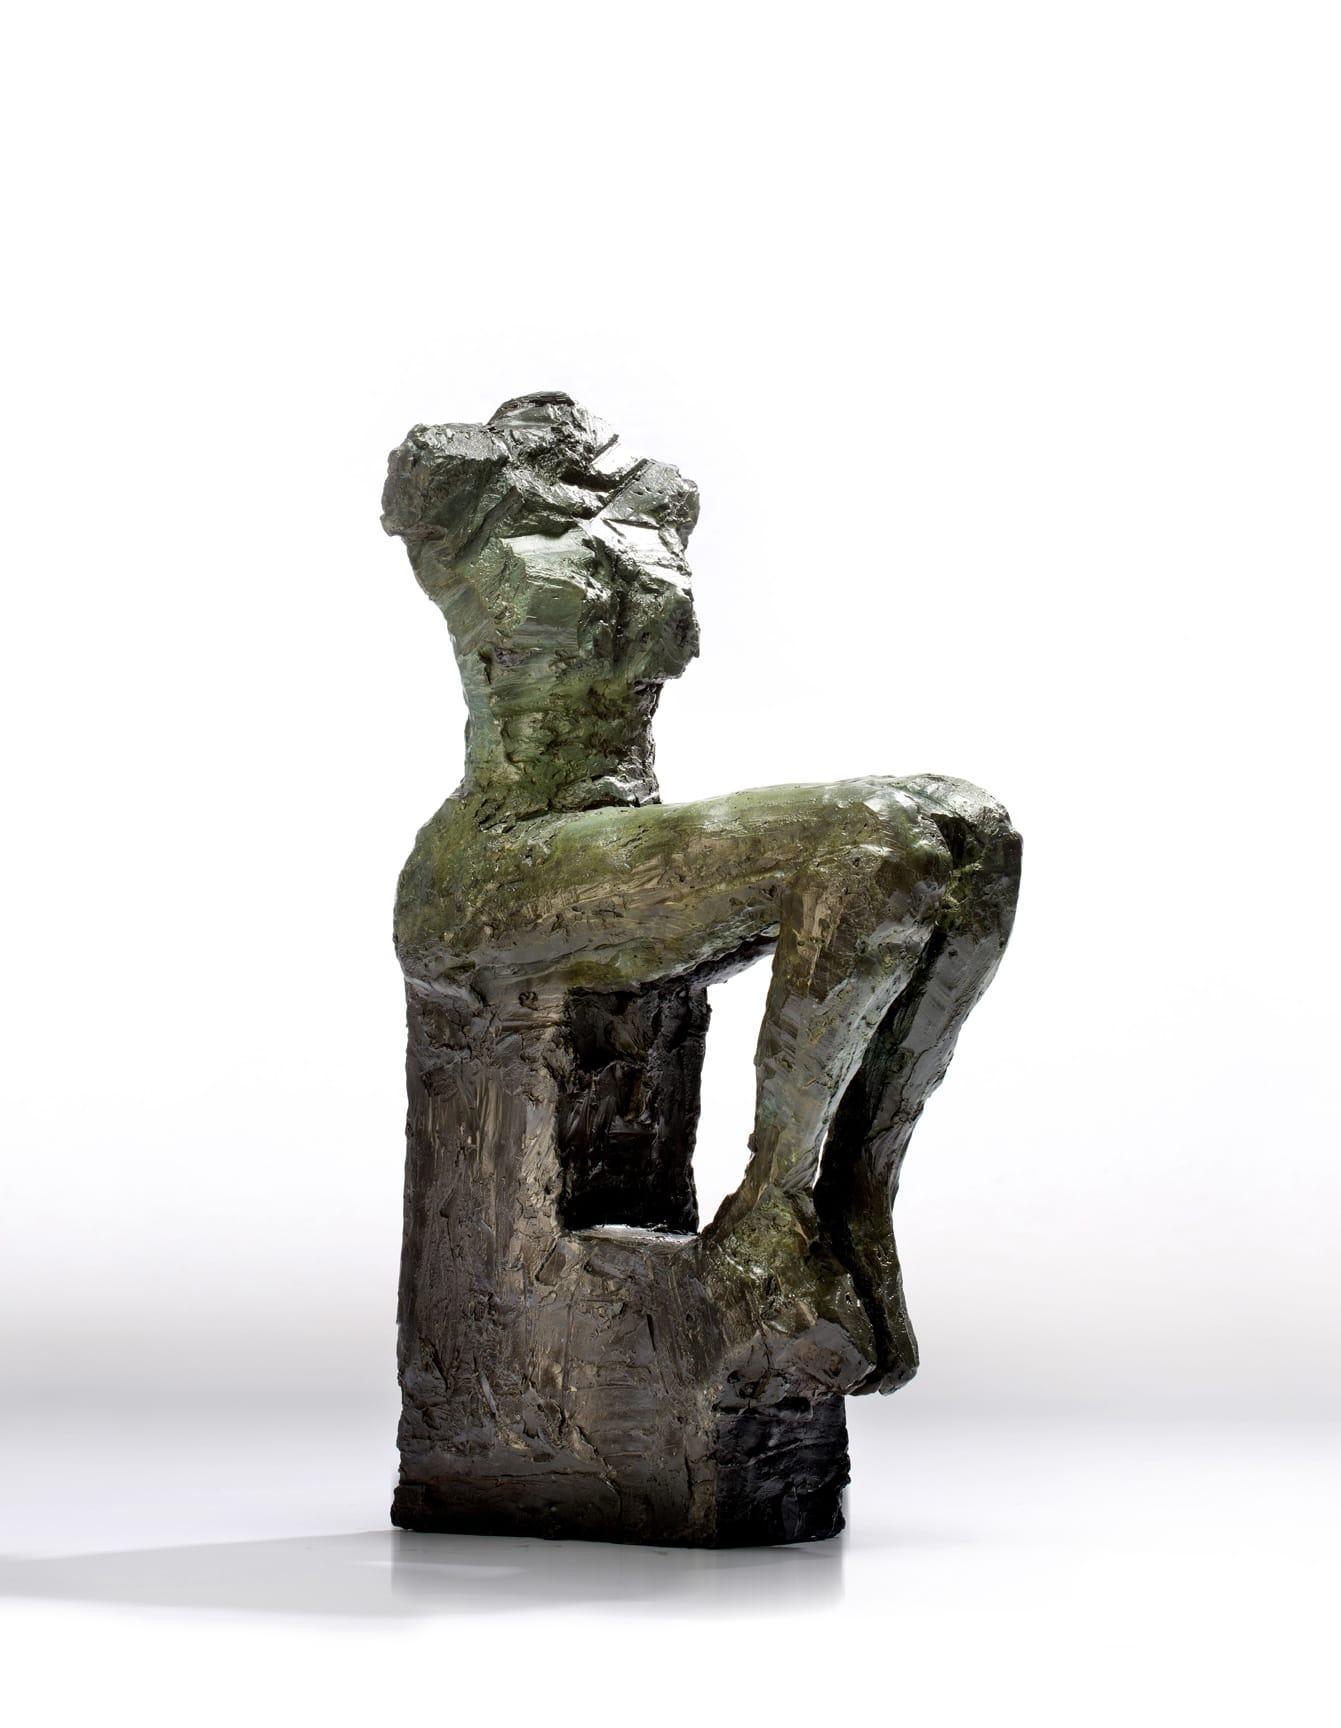 "<span class=""link fancybox-details-link""><a href=""/artworks/1663-emilio-diiorio-2014/"">View Detail Page</a></span><div class=""artist""><strong>Emilio DiIorio</strong></div> 2014 <div class=""medium"">bronze</div> <div class=""dimensions"">33"" x 11"" x 19""</div><div class=""copyright_line"">Copyright The Artist</div>"